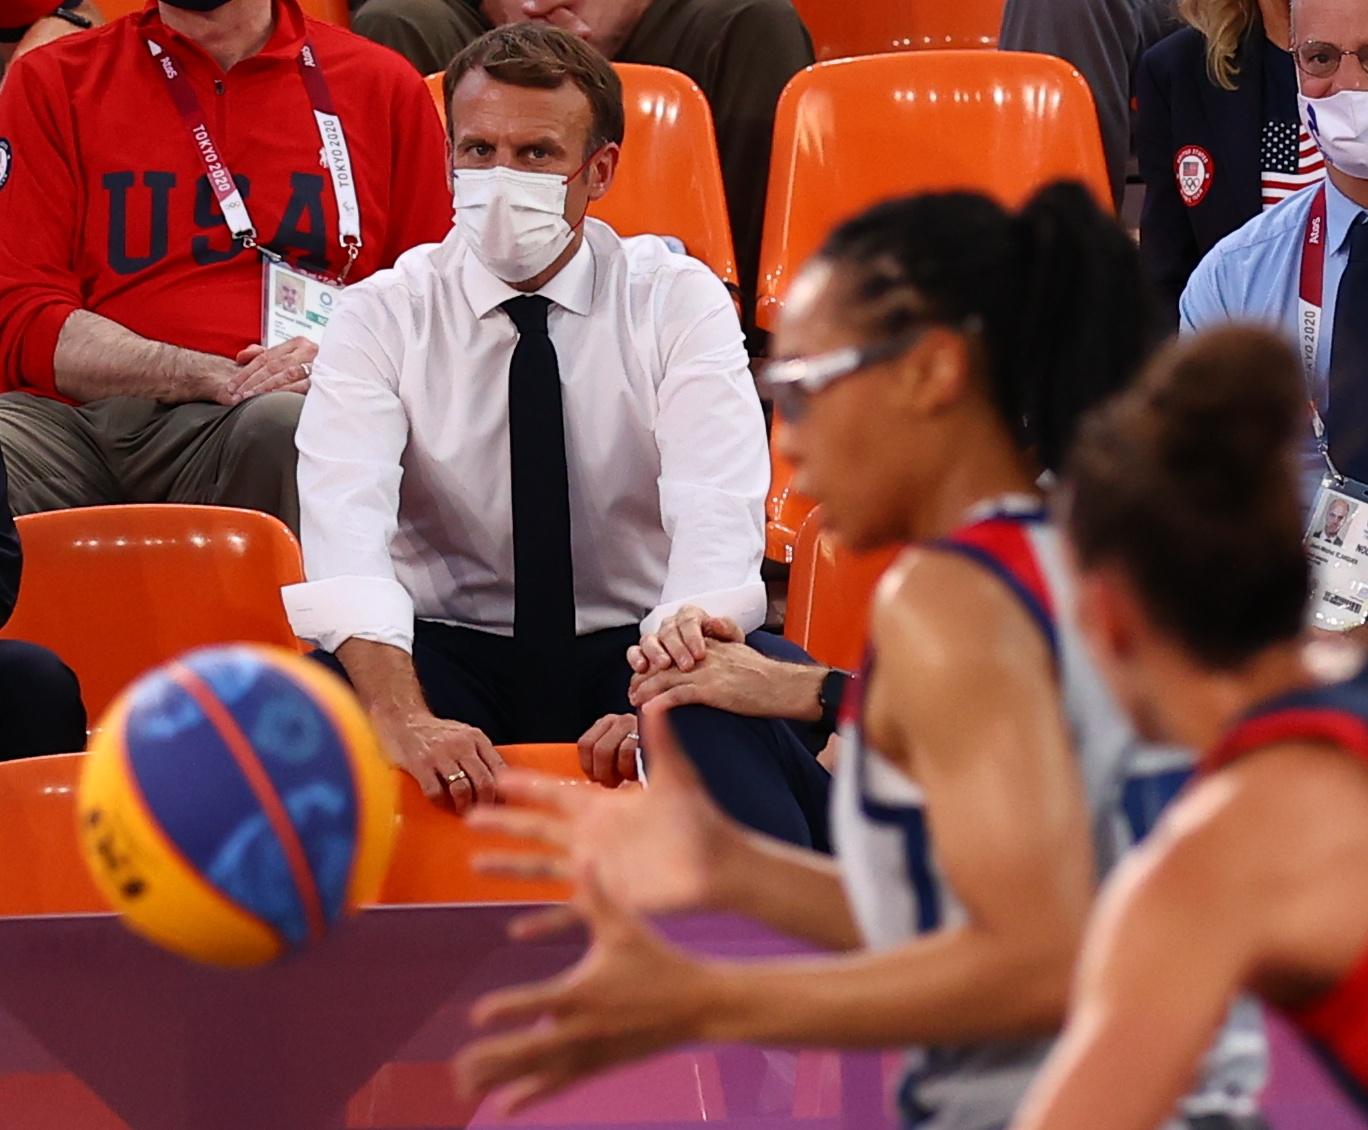 Tokyo 2020 Olympics - Basketball 3x3 - Women - Pool A - United States v France - Aomi Urban Sports Park, Tokyo, Japan - July 24, 2021. France president Emmanuel Macron  attends the match. REUTERS/Andrew Boyers